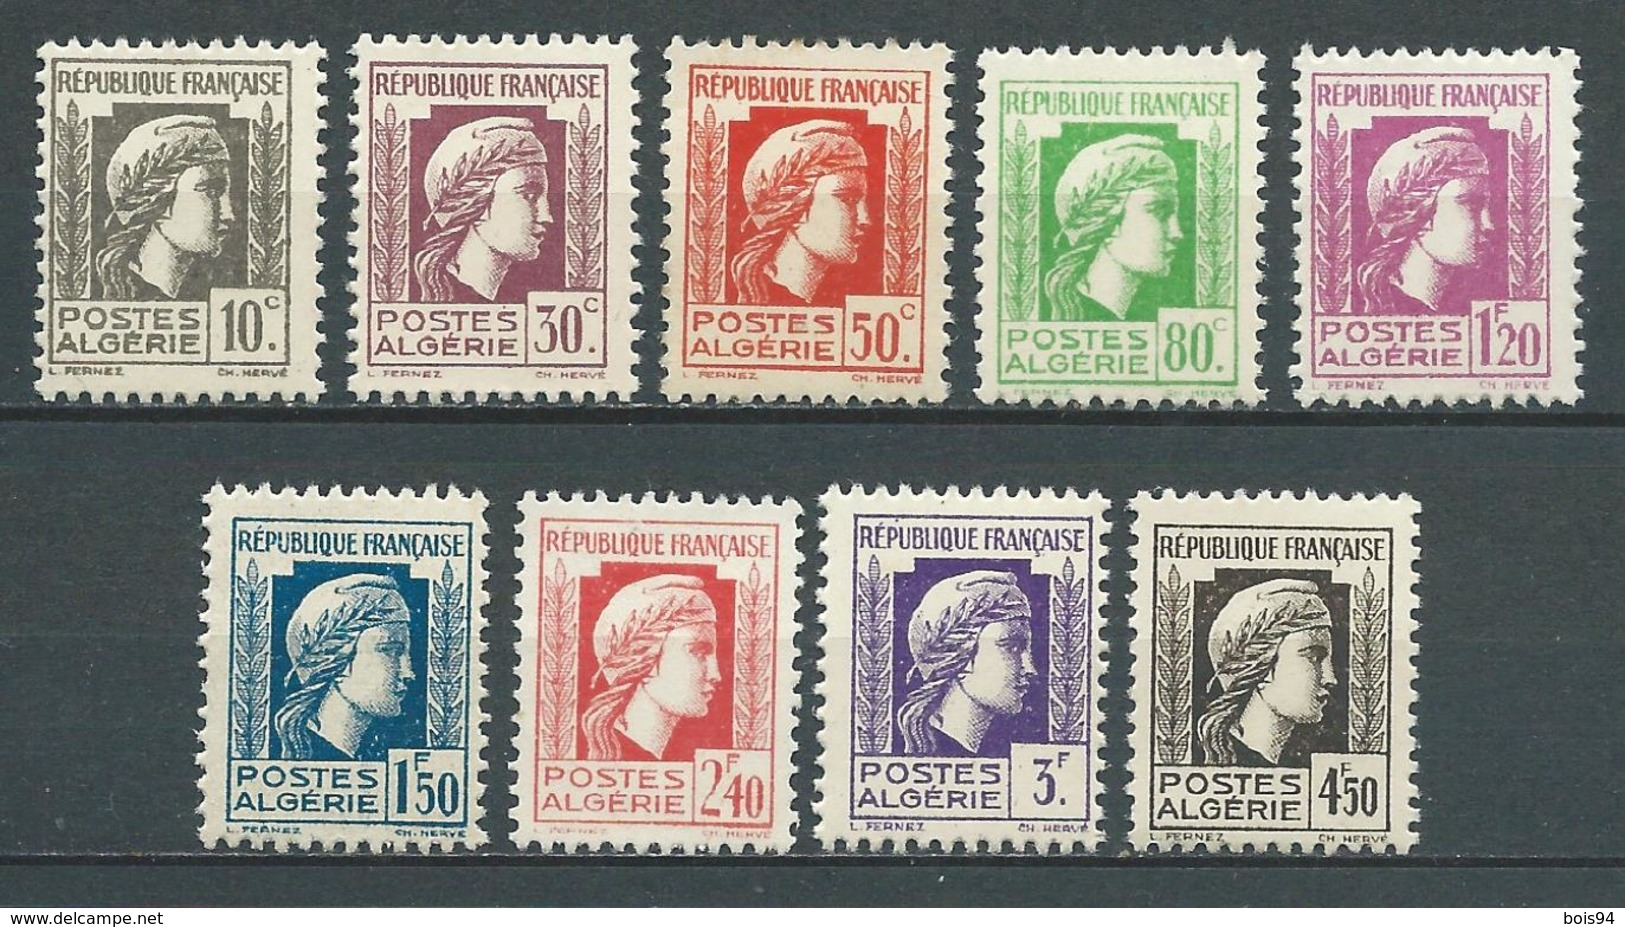 ALGERIE 1944 . Série N°s 209 à 217 . Neufs ** (MNH) - Algérie (1924-1962)